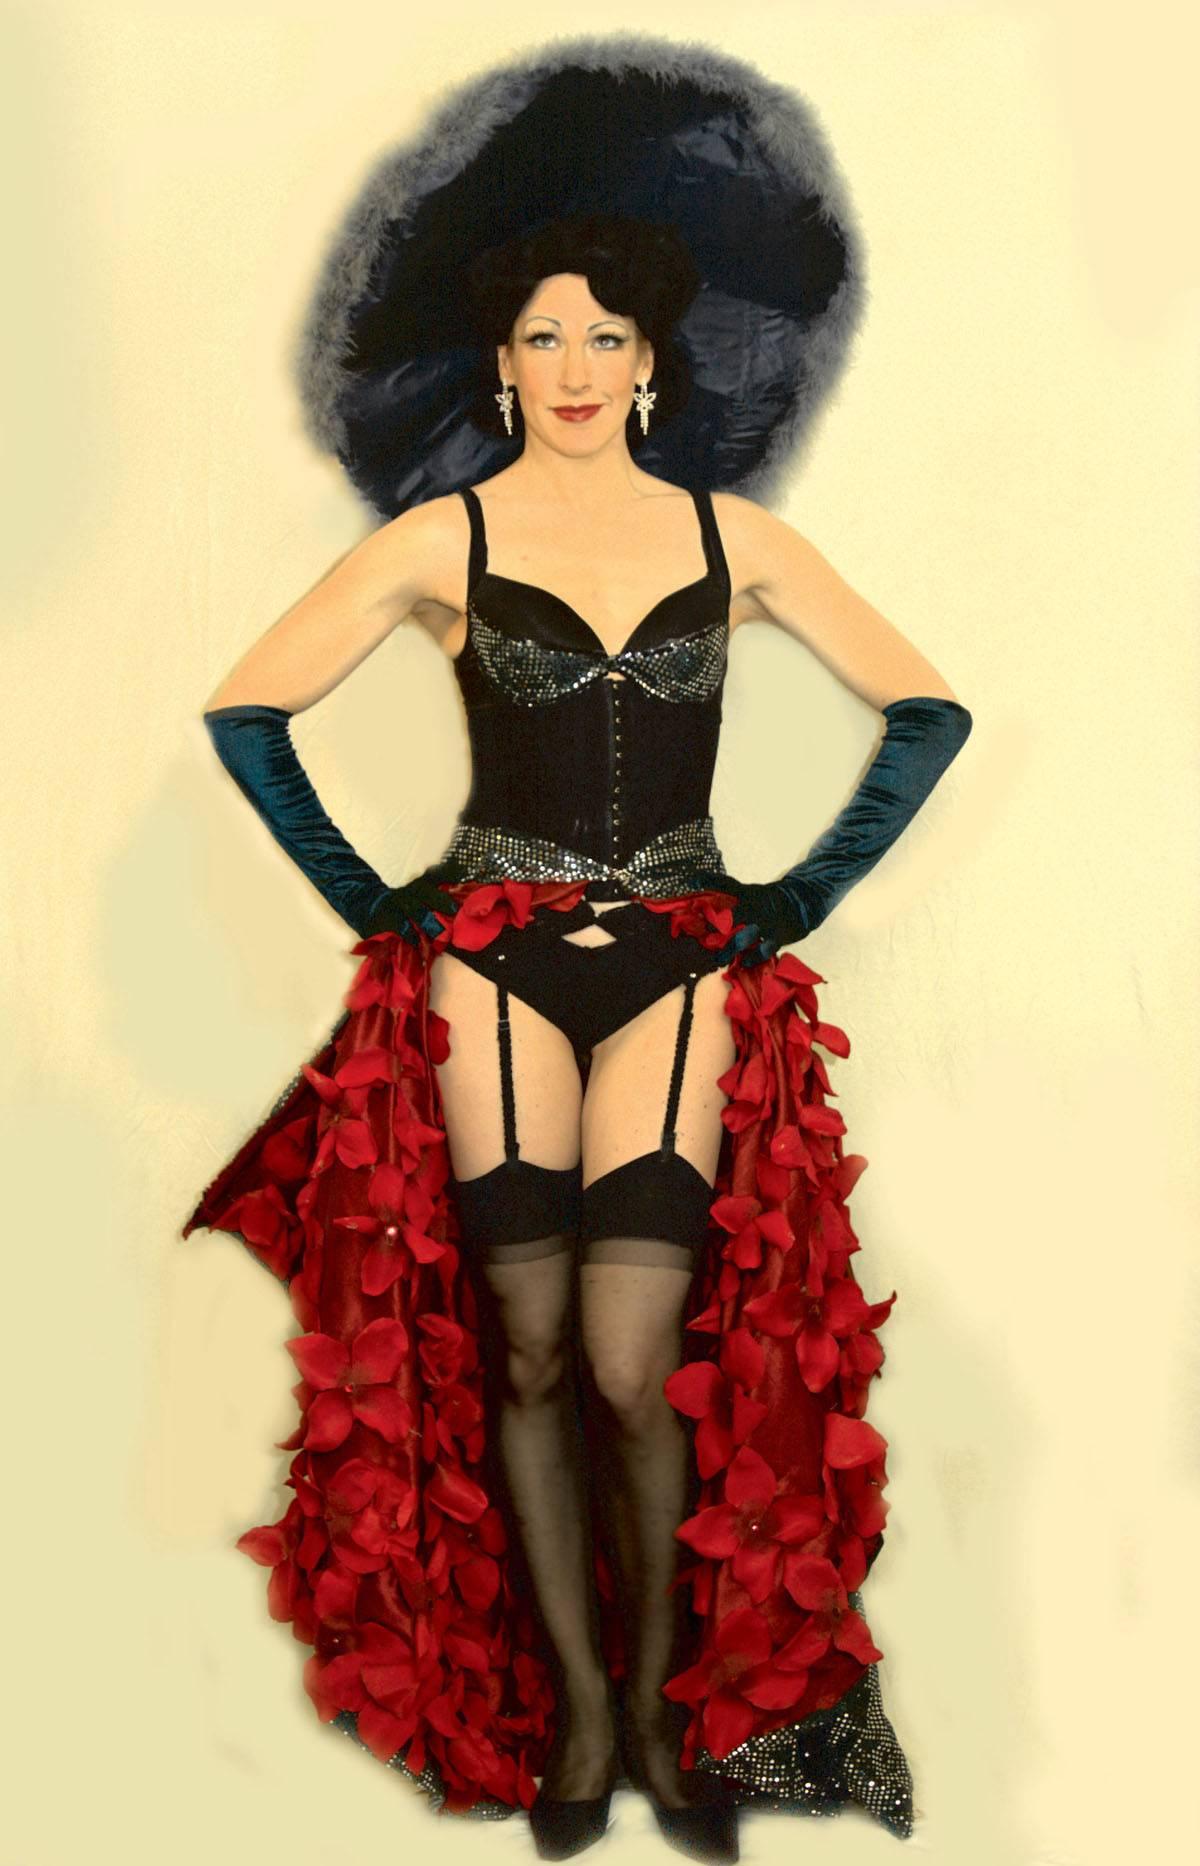 Burgundy Brixx burlesque dancer